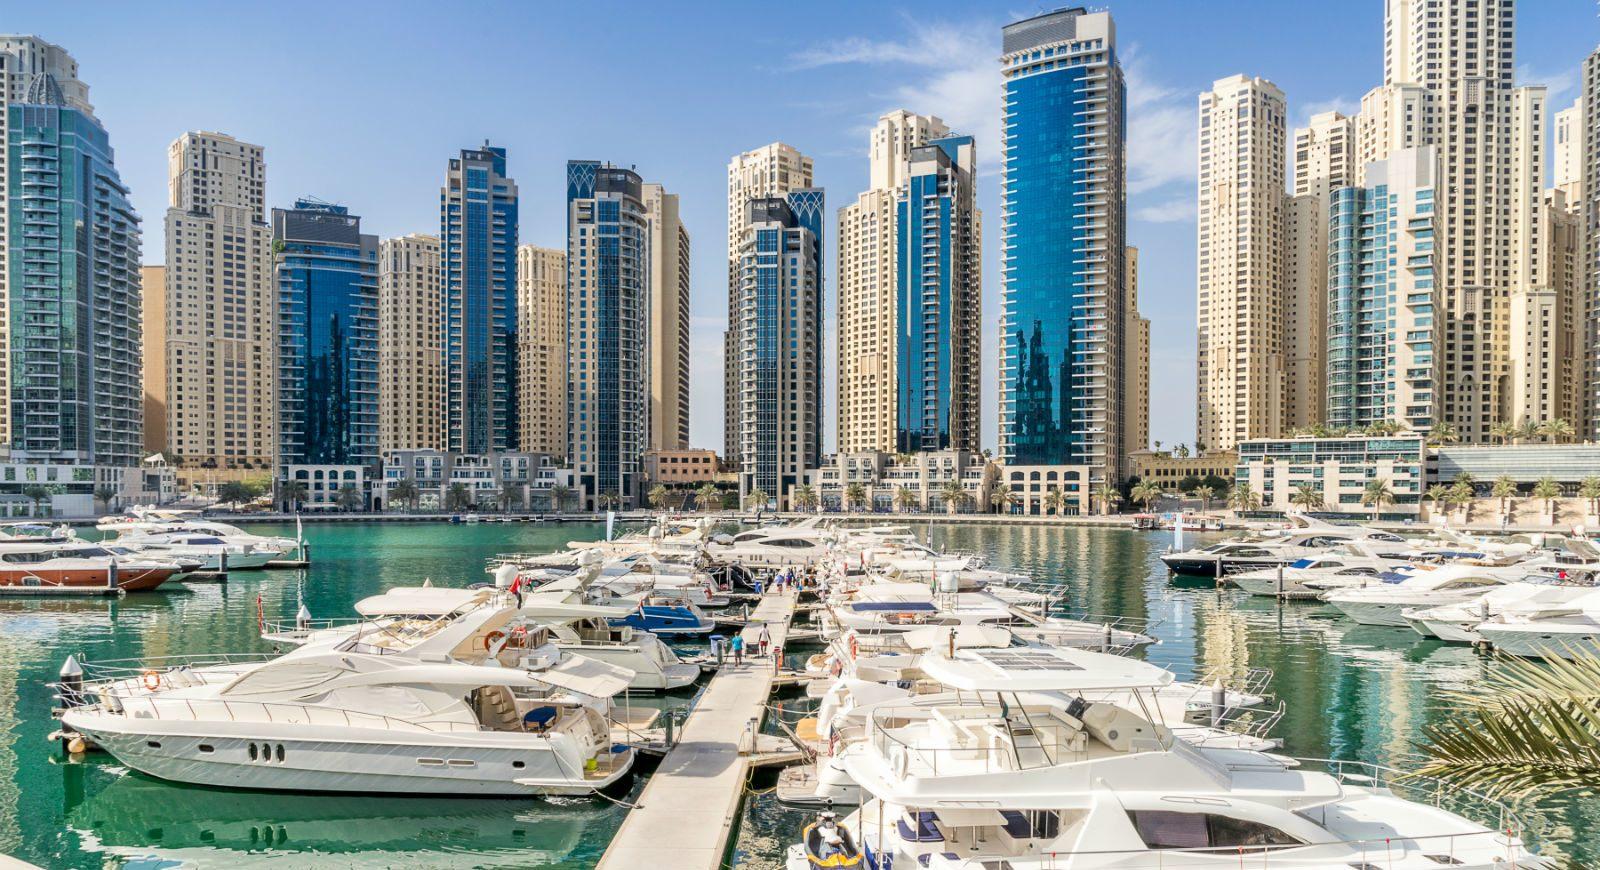 Dubai porngalleries, christy mack rachel starr